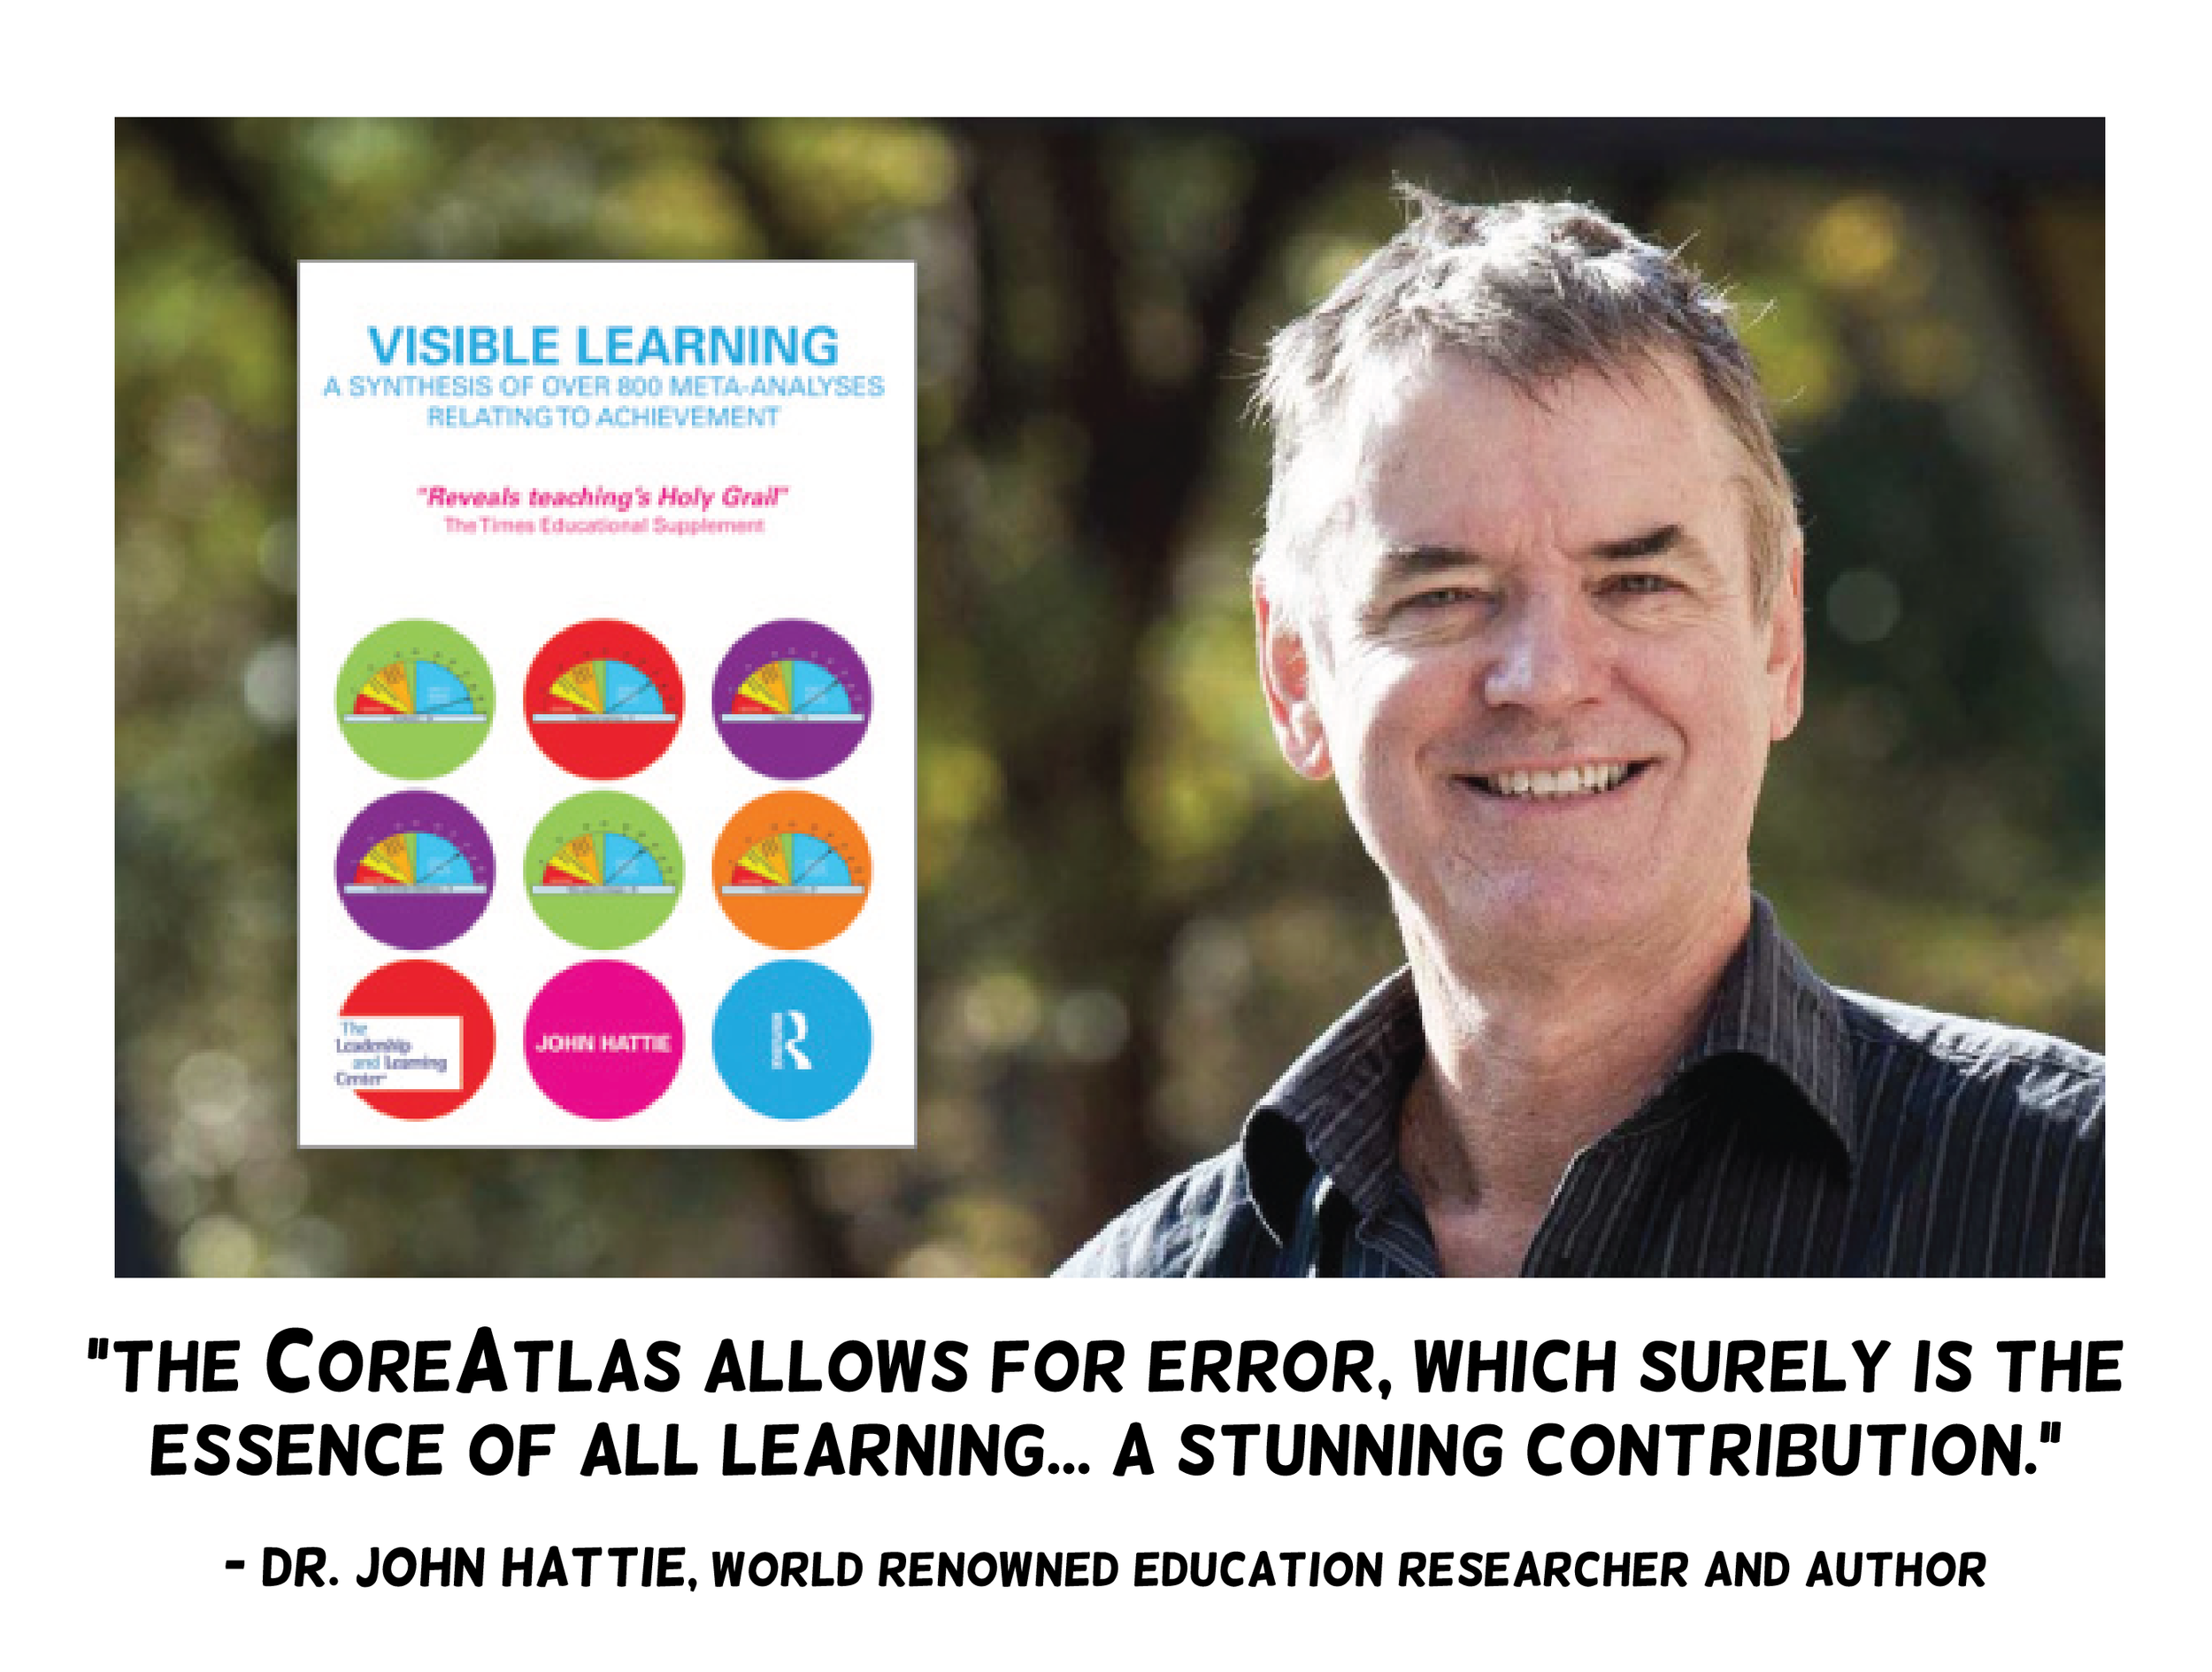 John Hattie endorsement of CoreAtlas